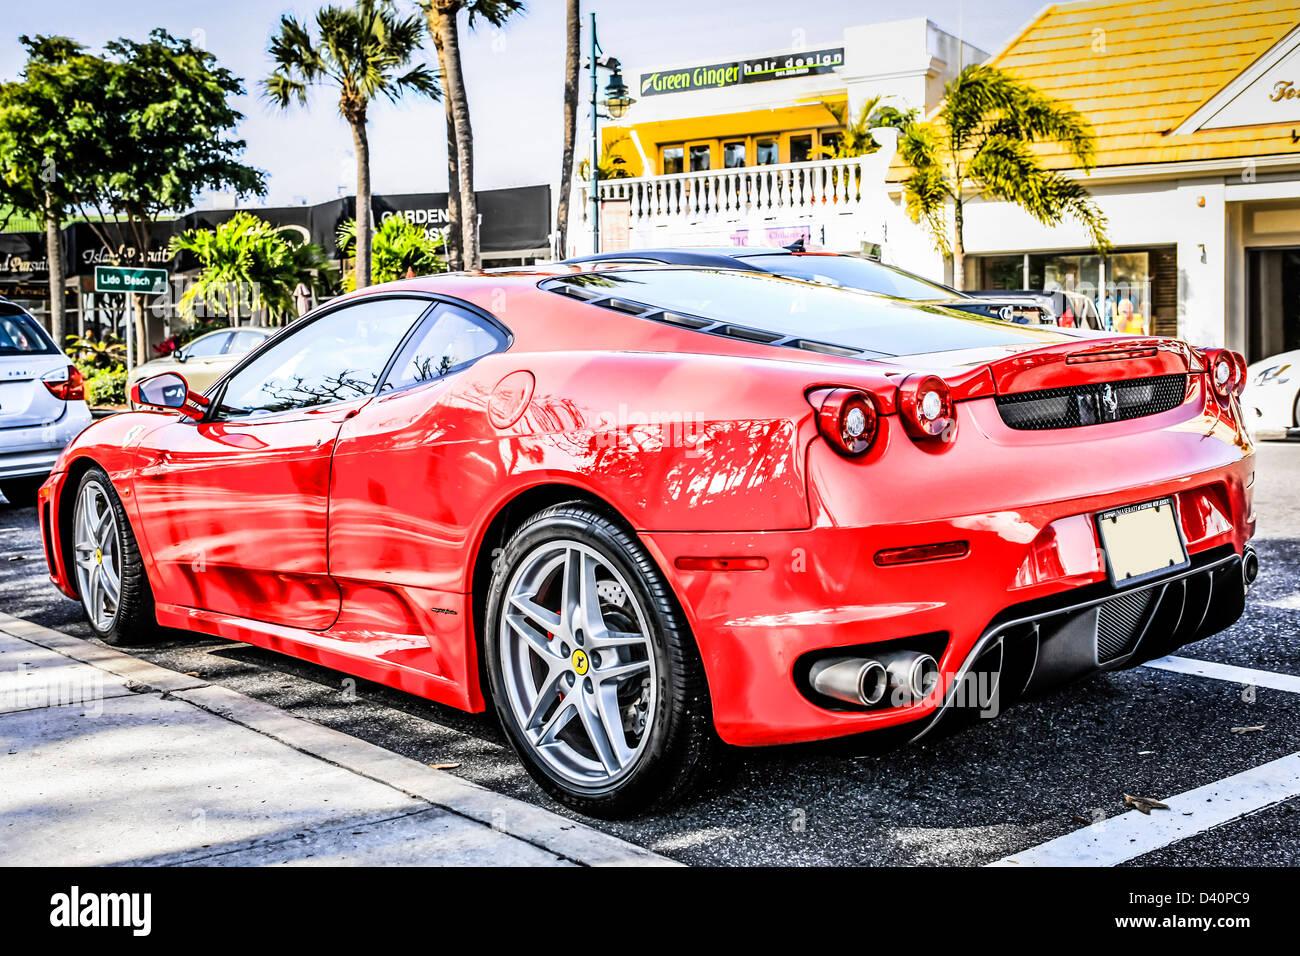 Roter Ferrari F430 Auf Der Exot In Sarasota Florida Stockfotografie Alamy